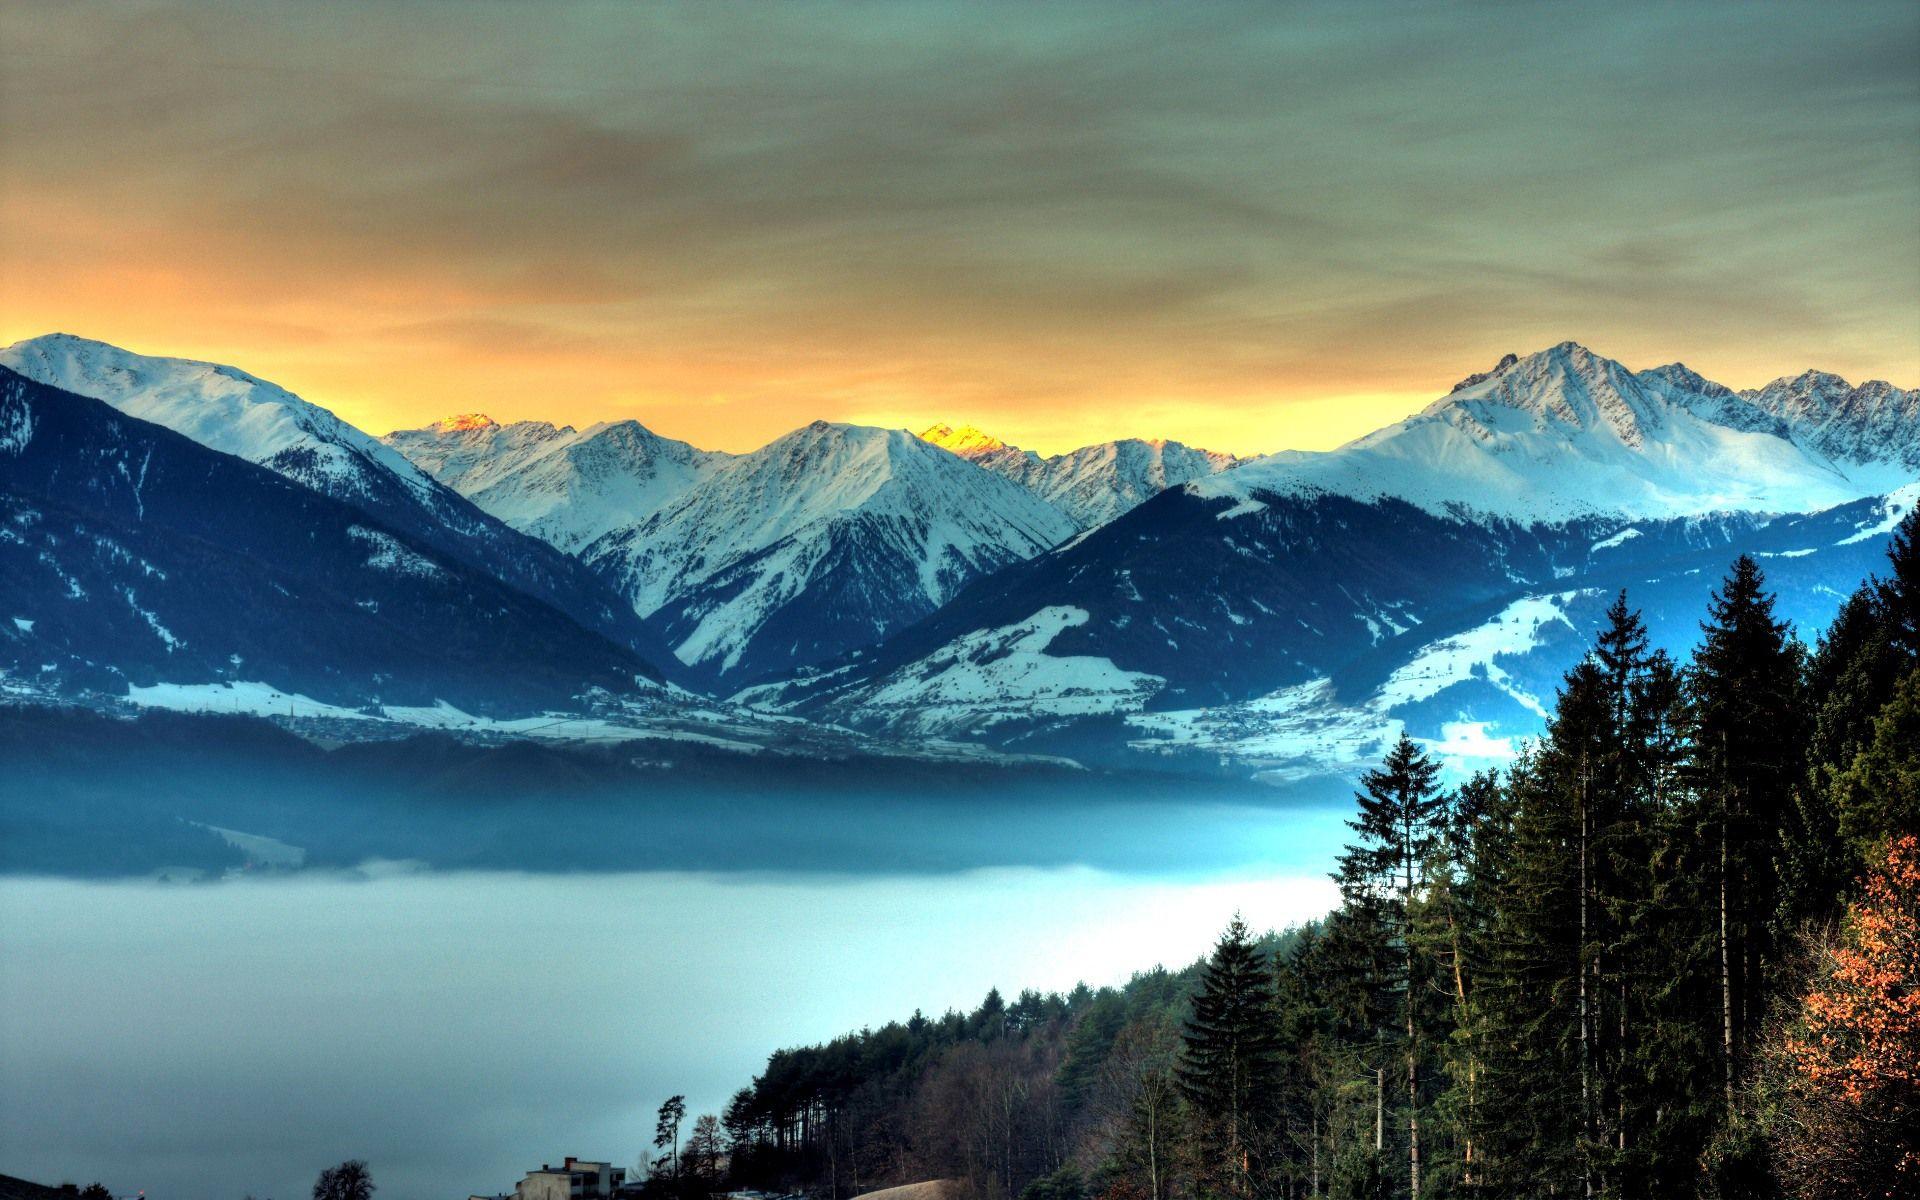 Windows 7 Desktop Backgrounds Mountains Need travel tips